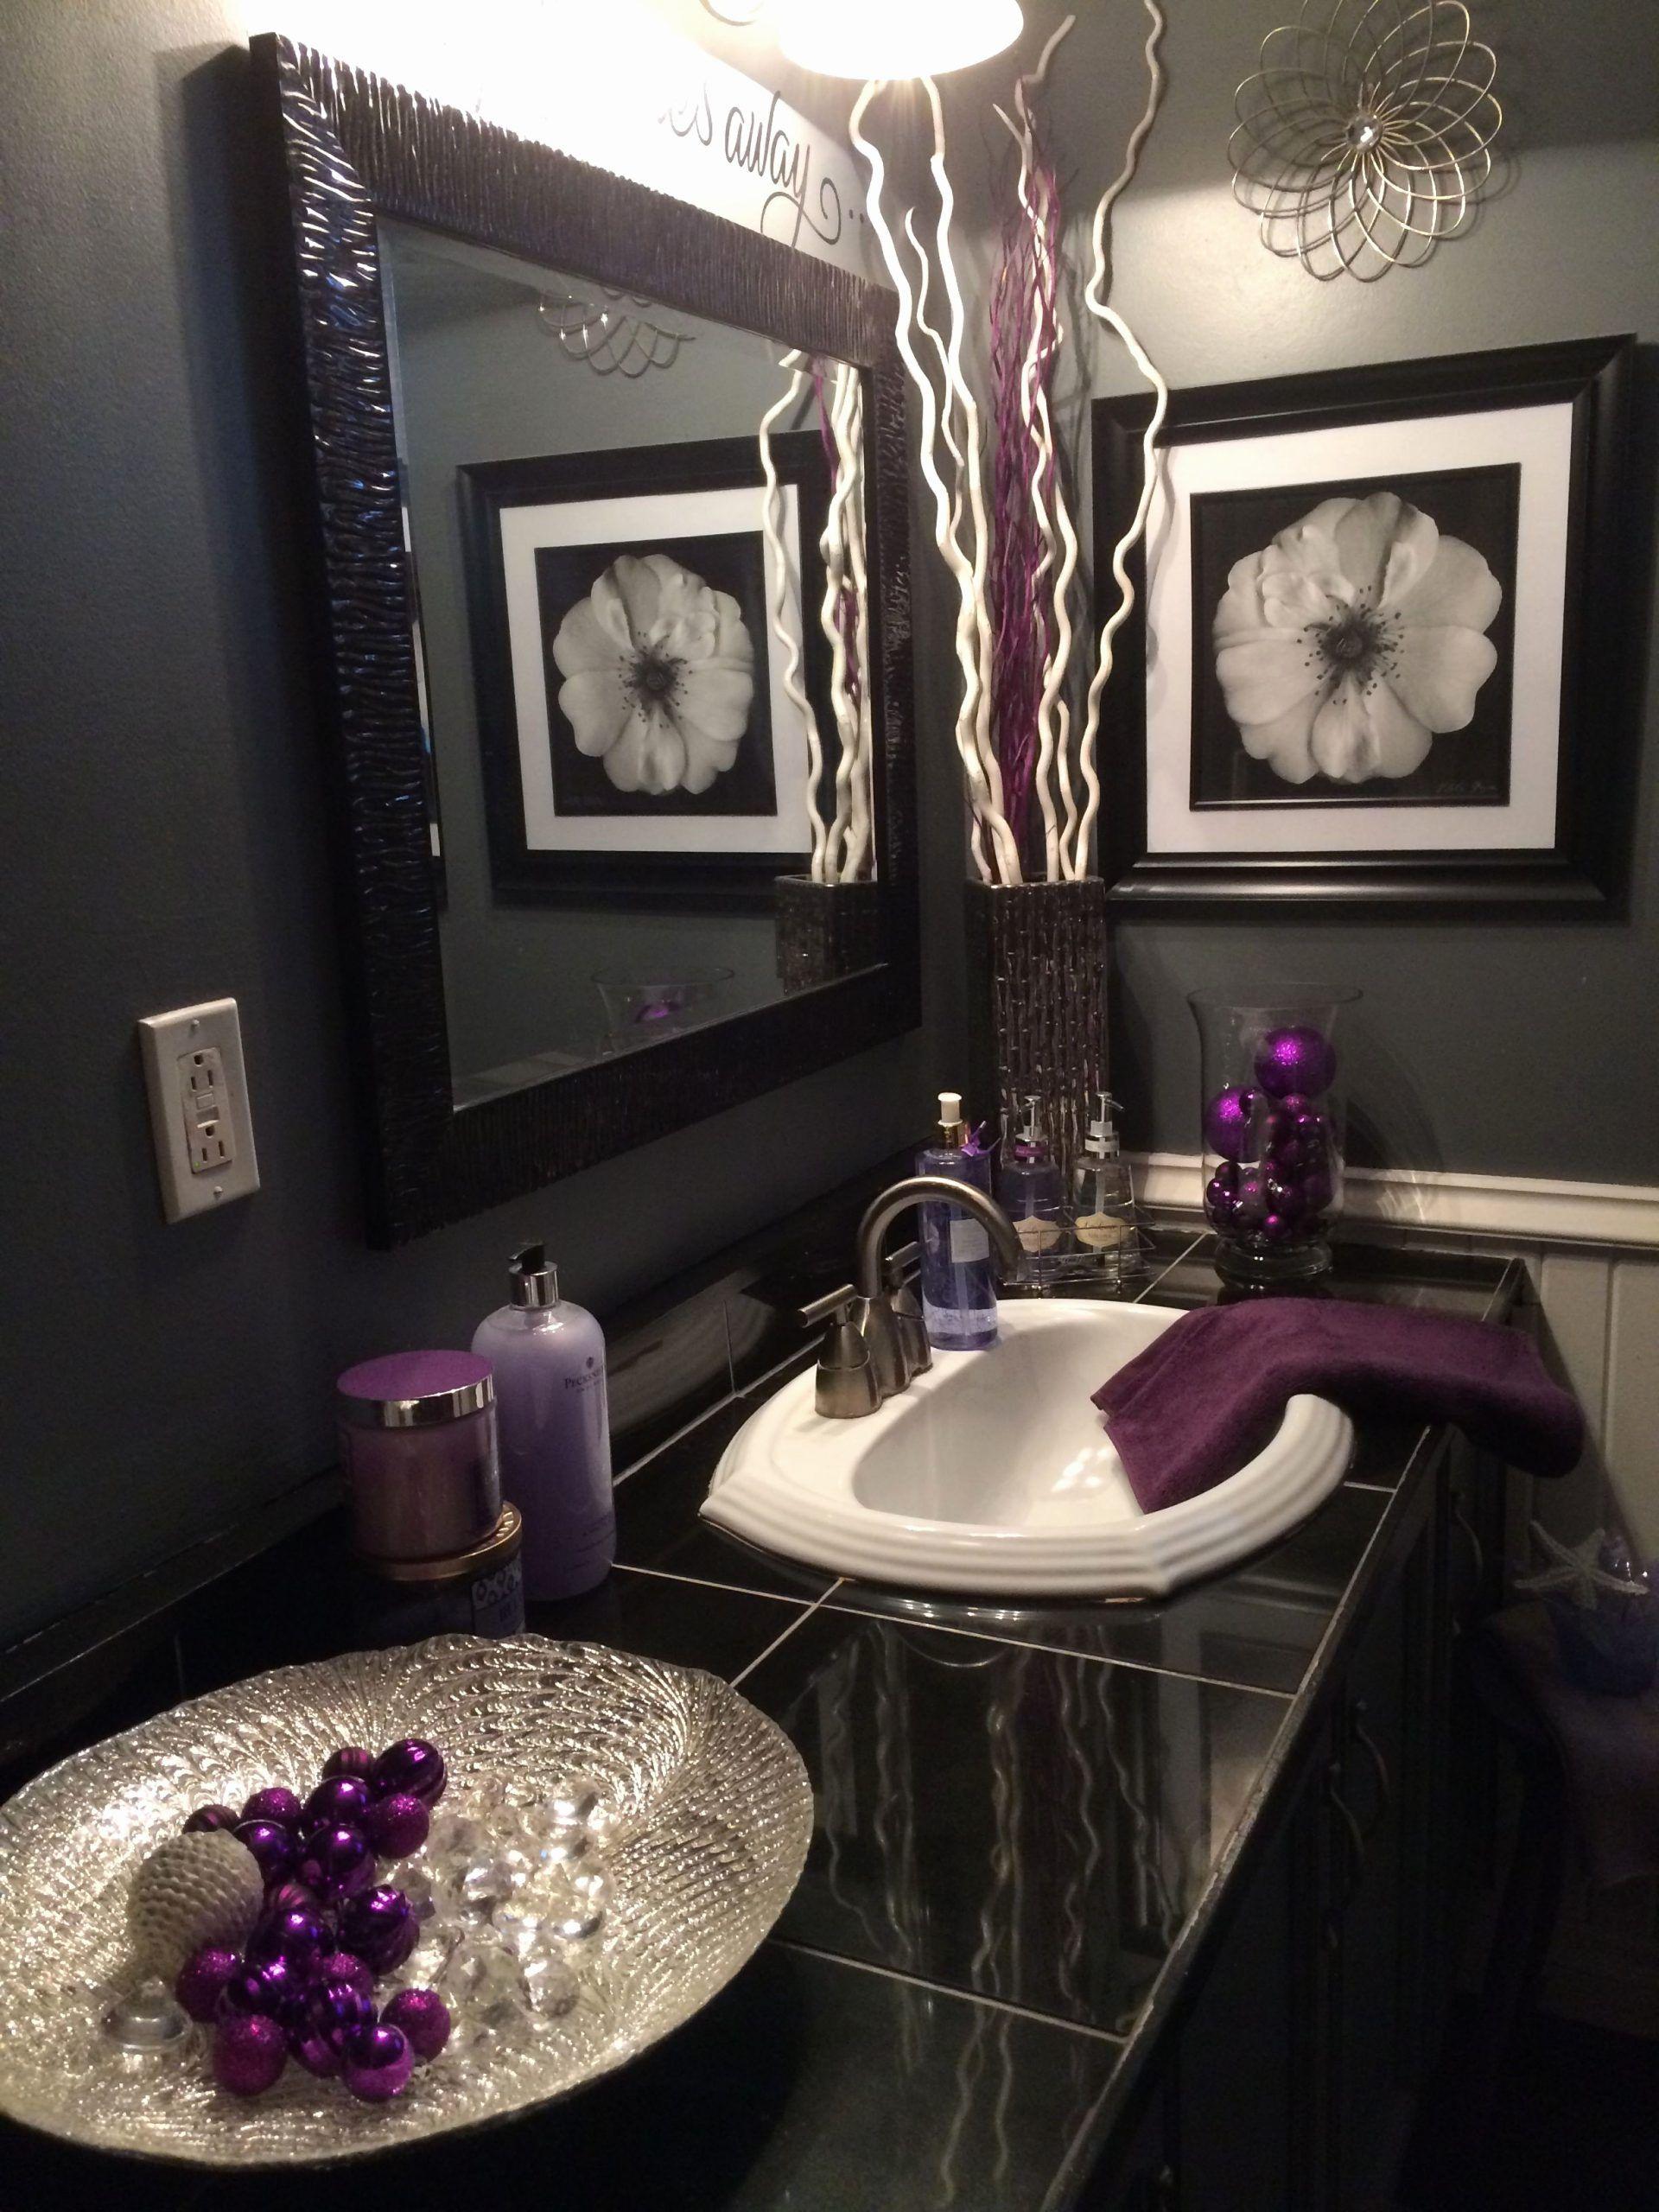 Pin On Modern Bath Decor Ideas 2020